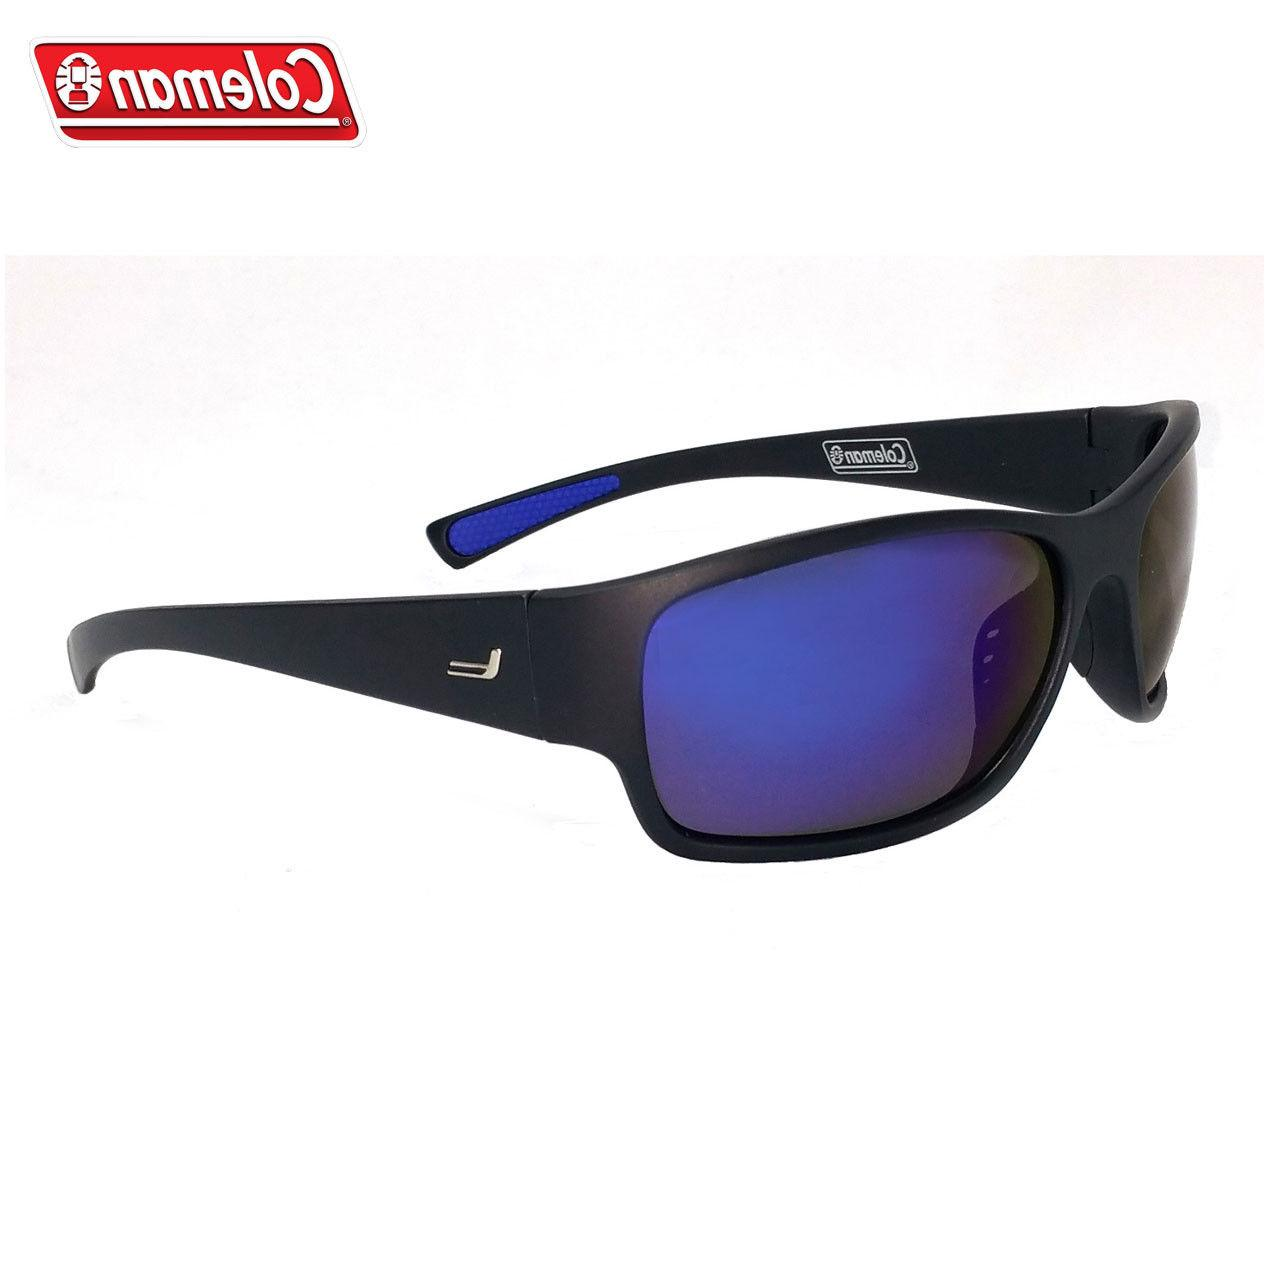 backpacker polarized sunglasses black matte blue mirror